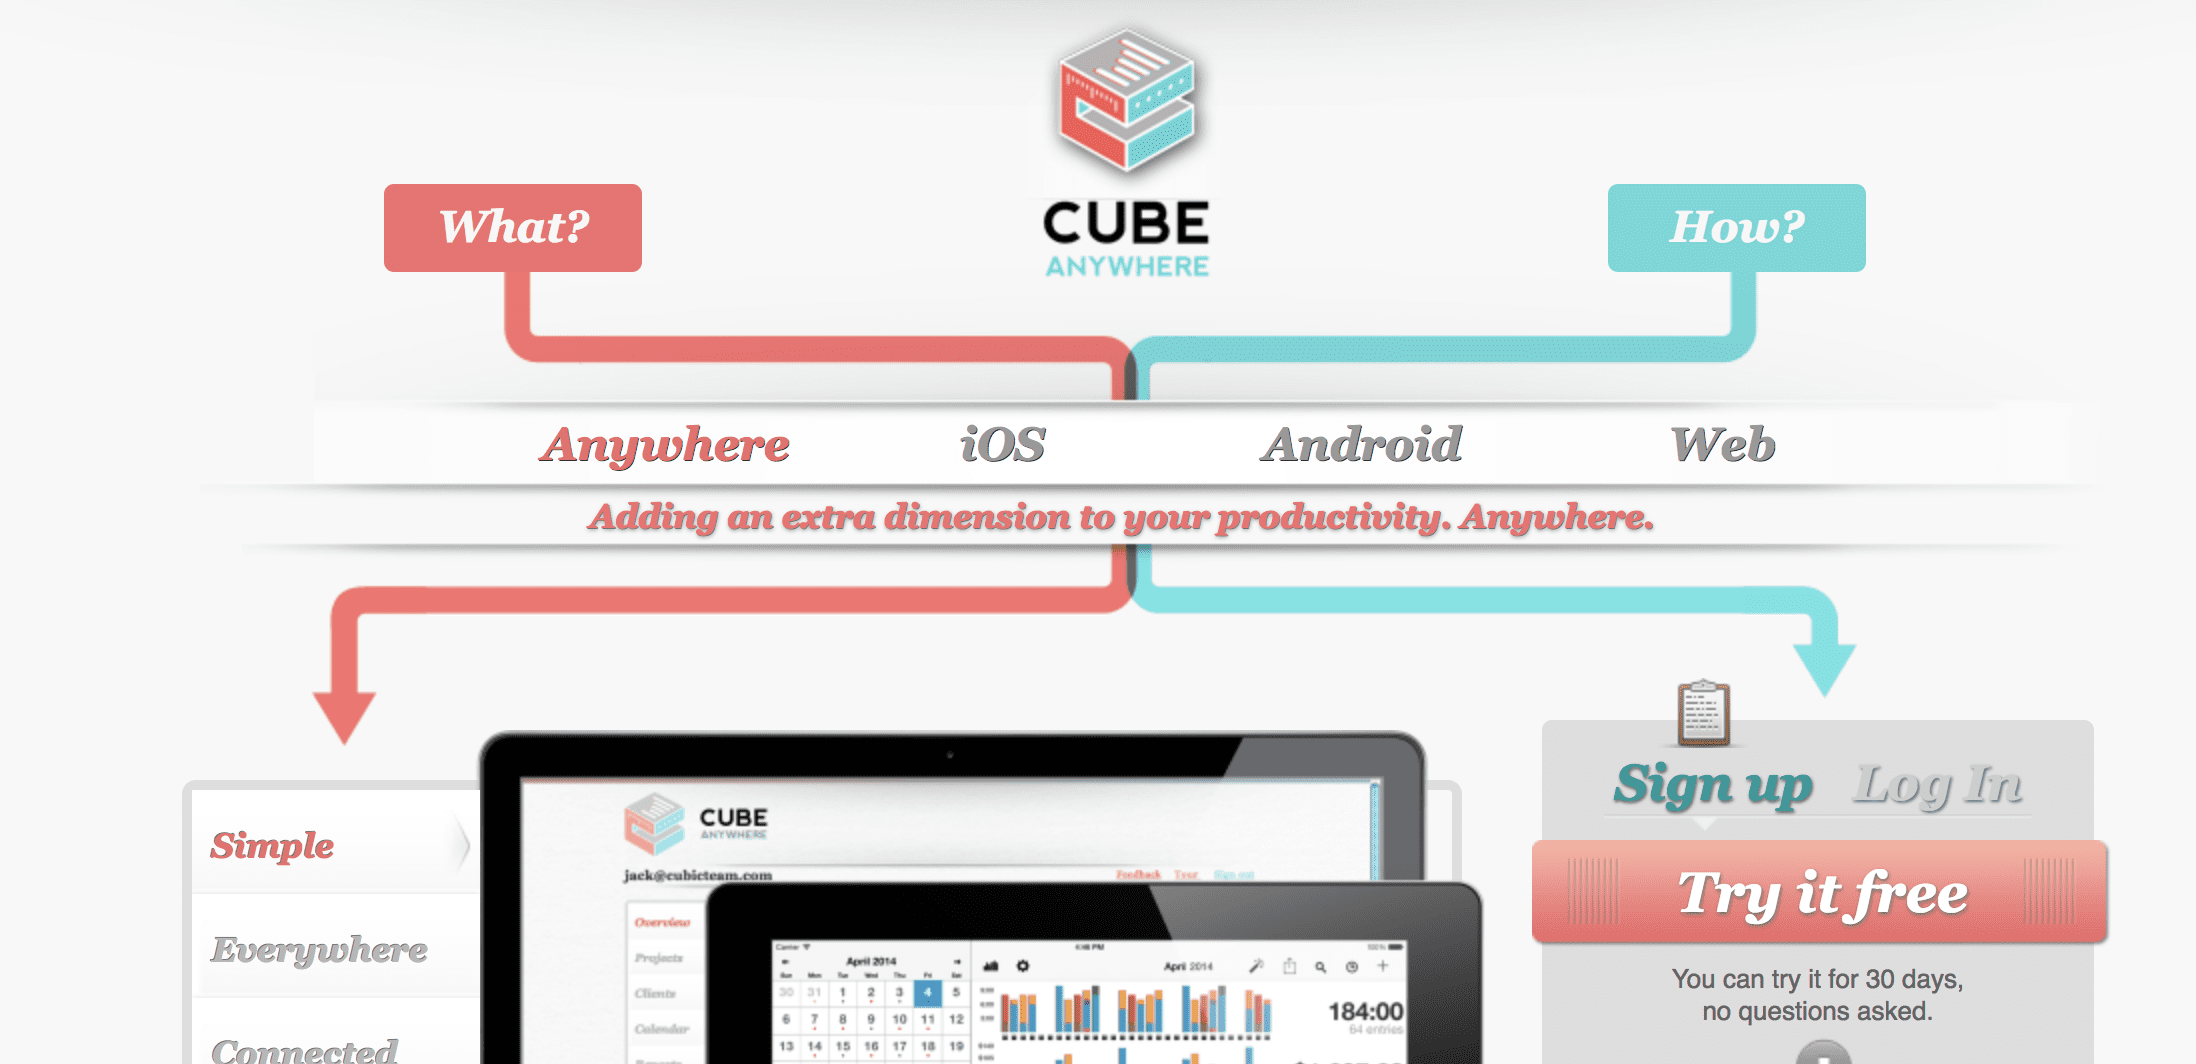 CubeCalendarIntegration